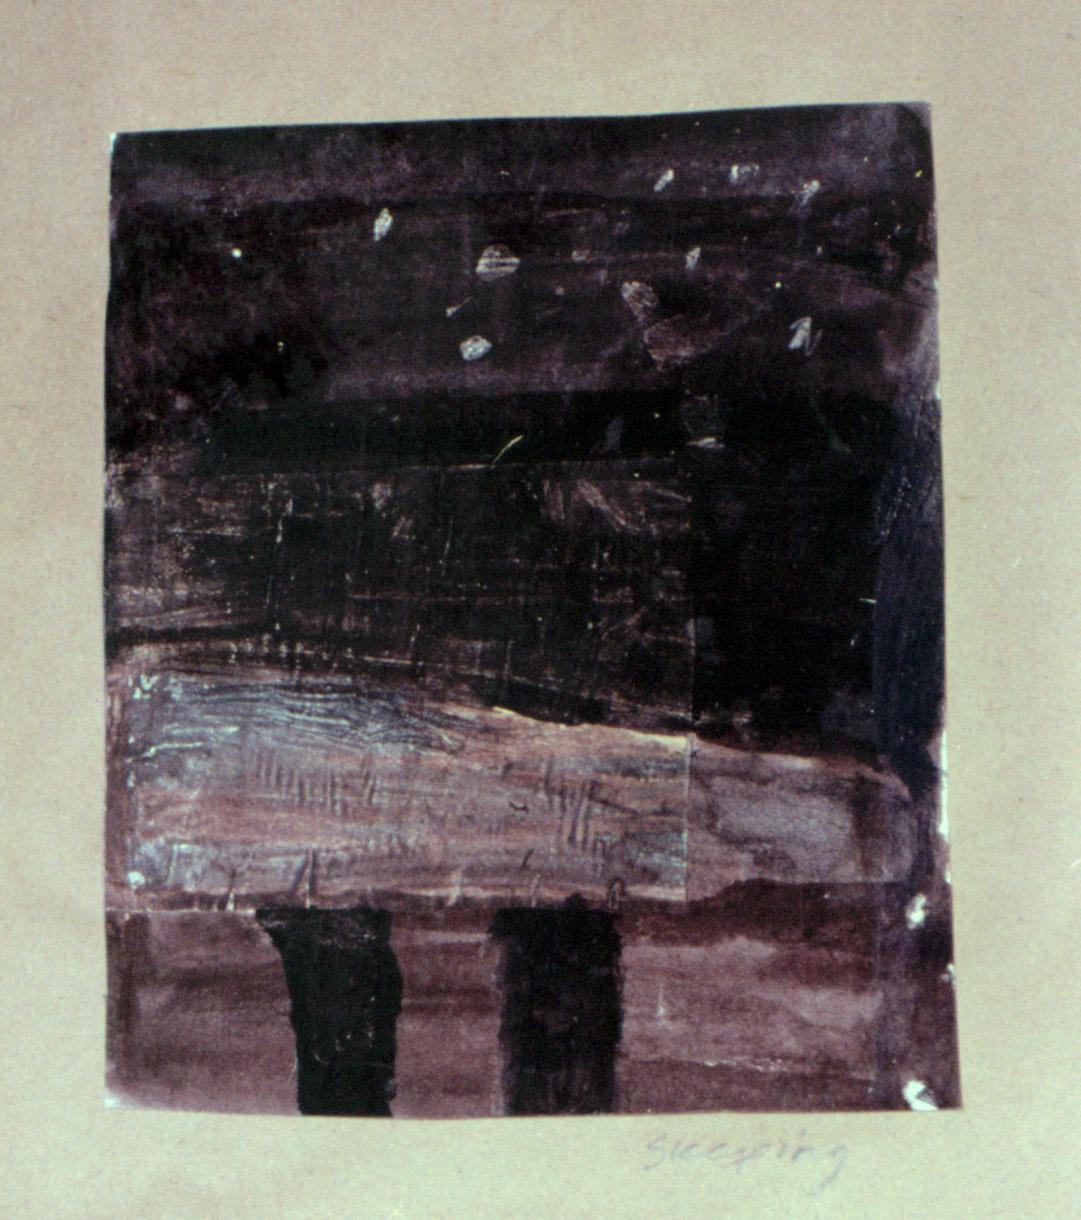 Tina Douglas | untitled | 30 x 21 cm | Acrylic, ink on Scientific American magazine page | 1993